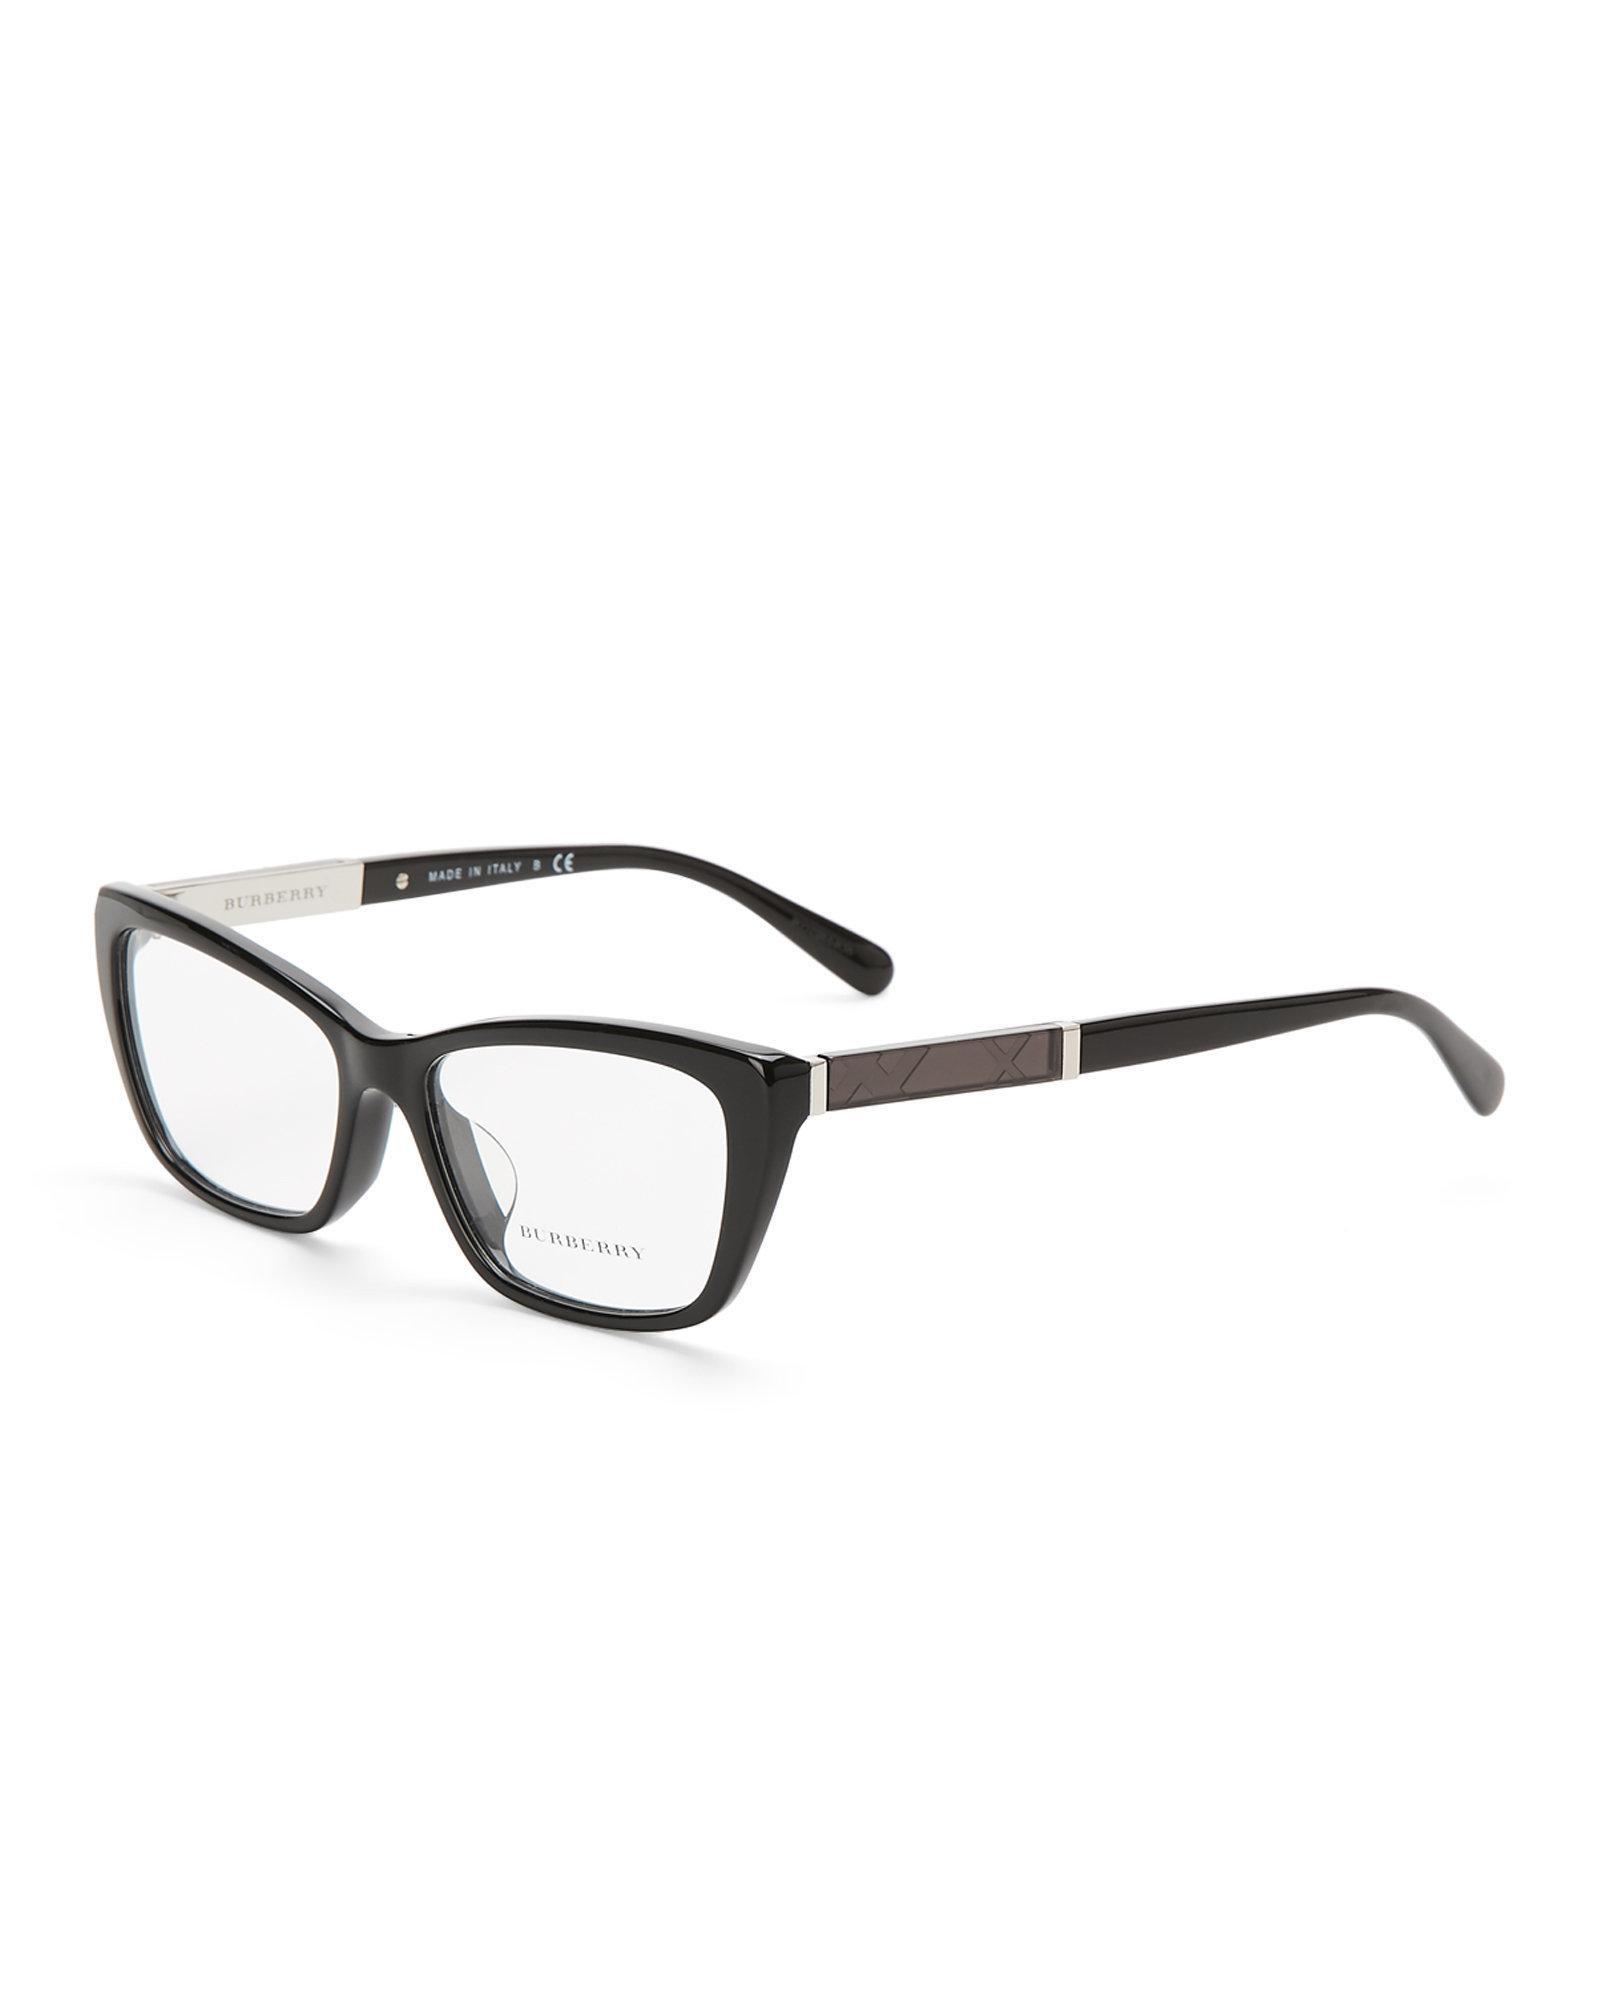 Lyst - Burberry Be2236 Black Angular Cat Eye Optical Frames in Black